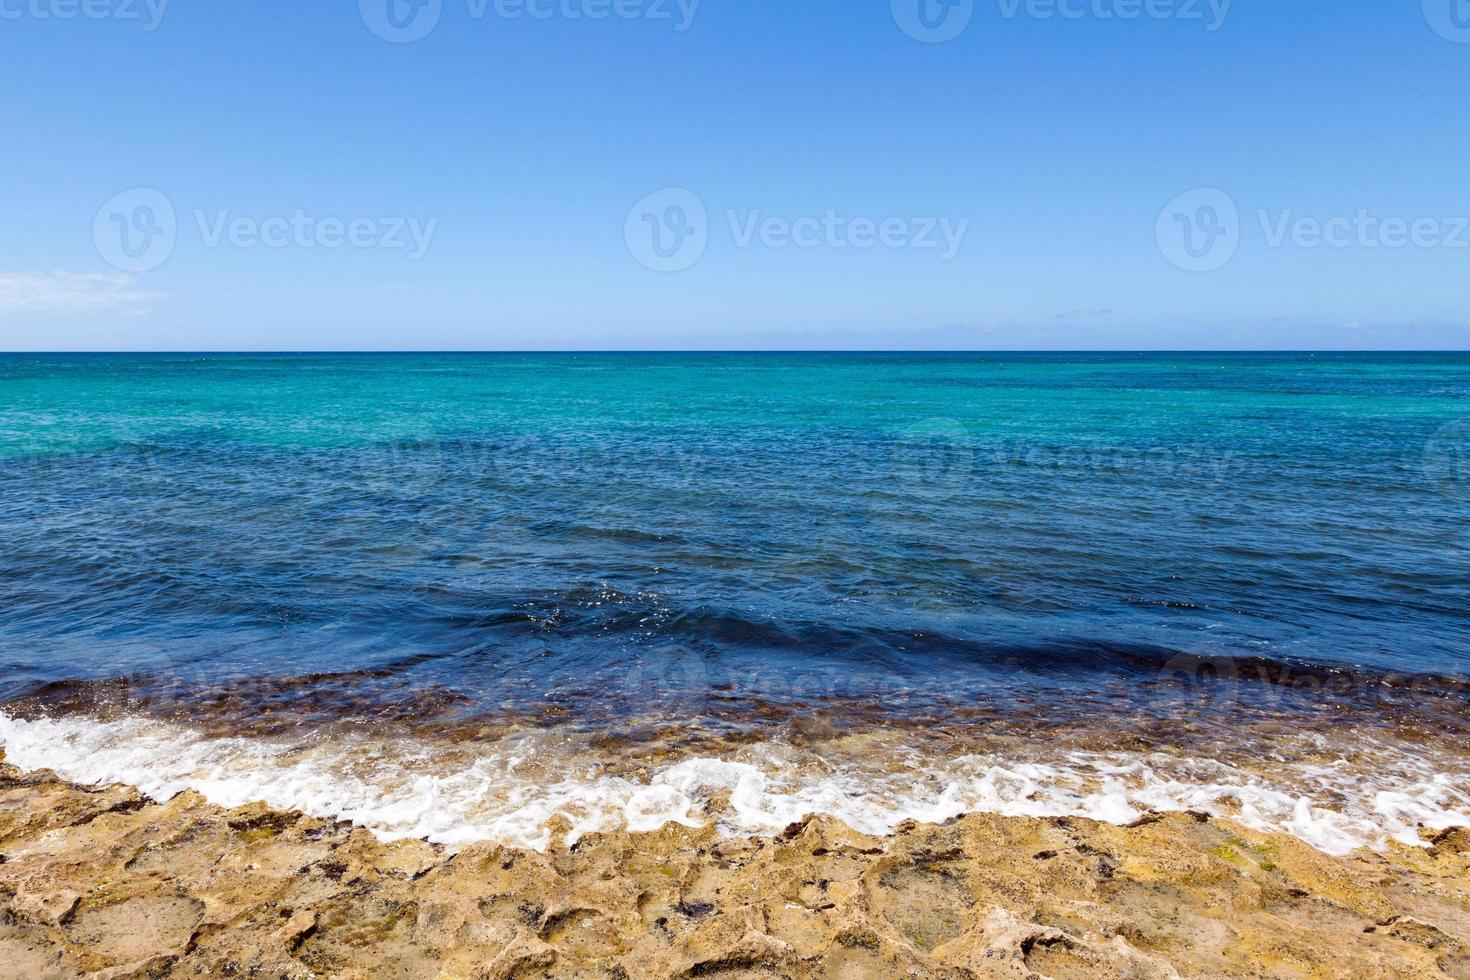 golven breken op de kust foto